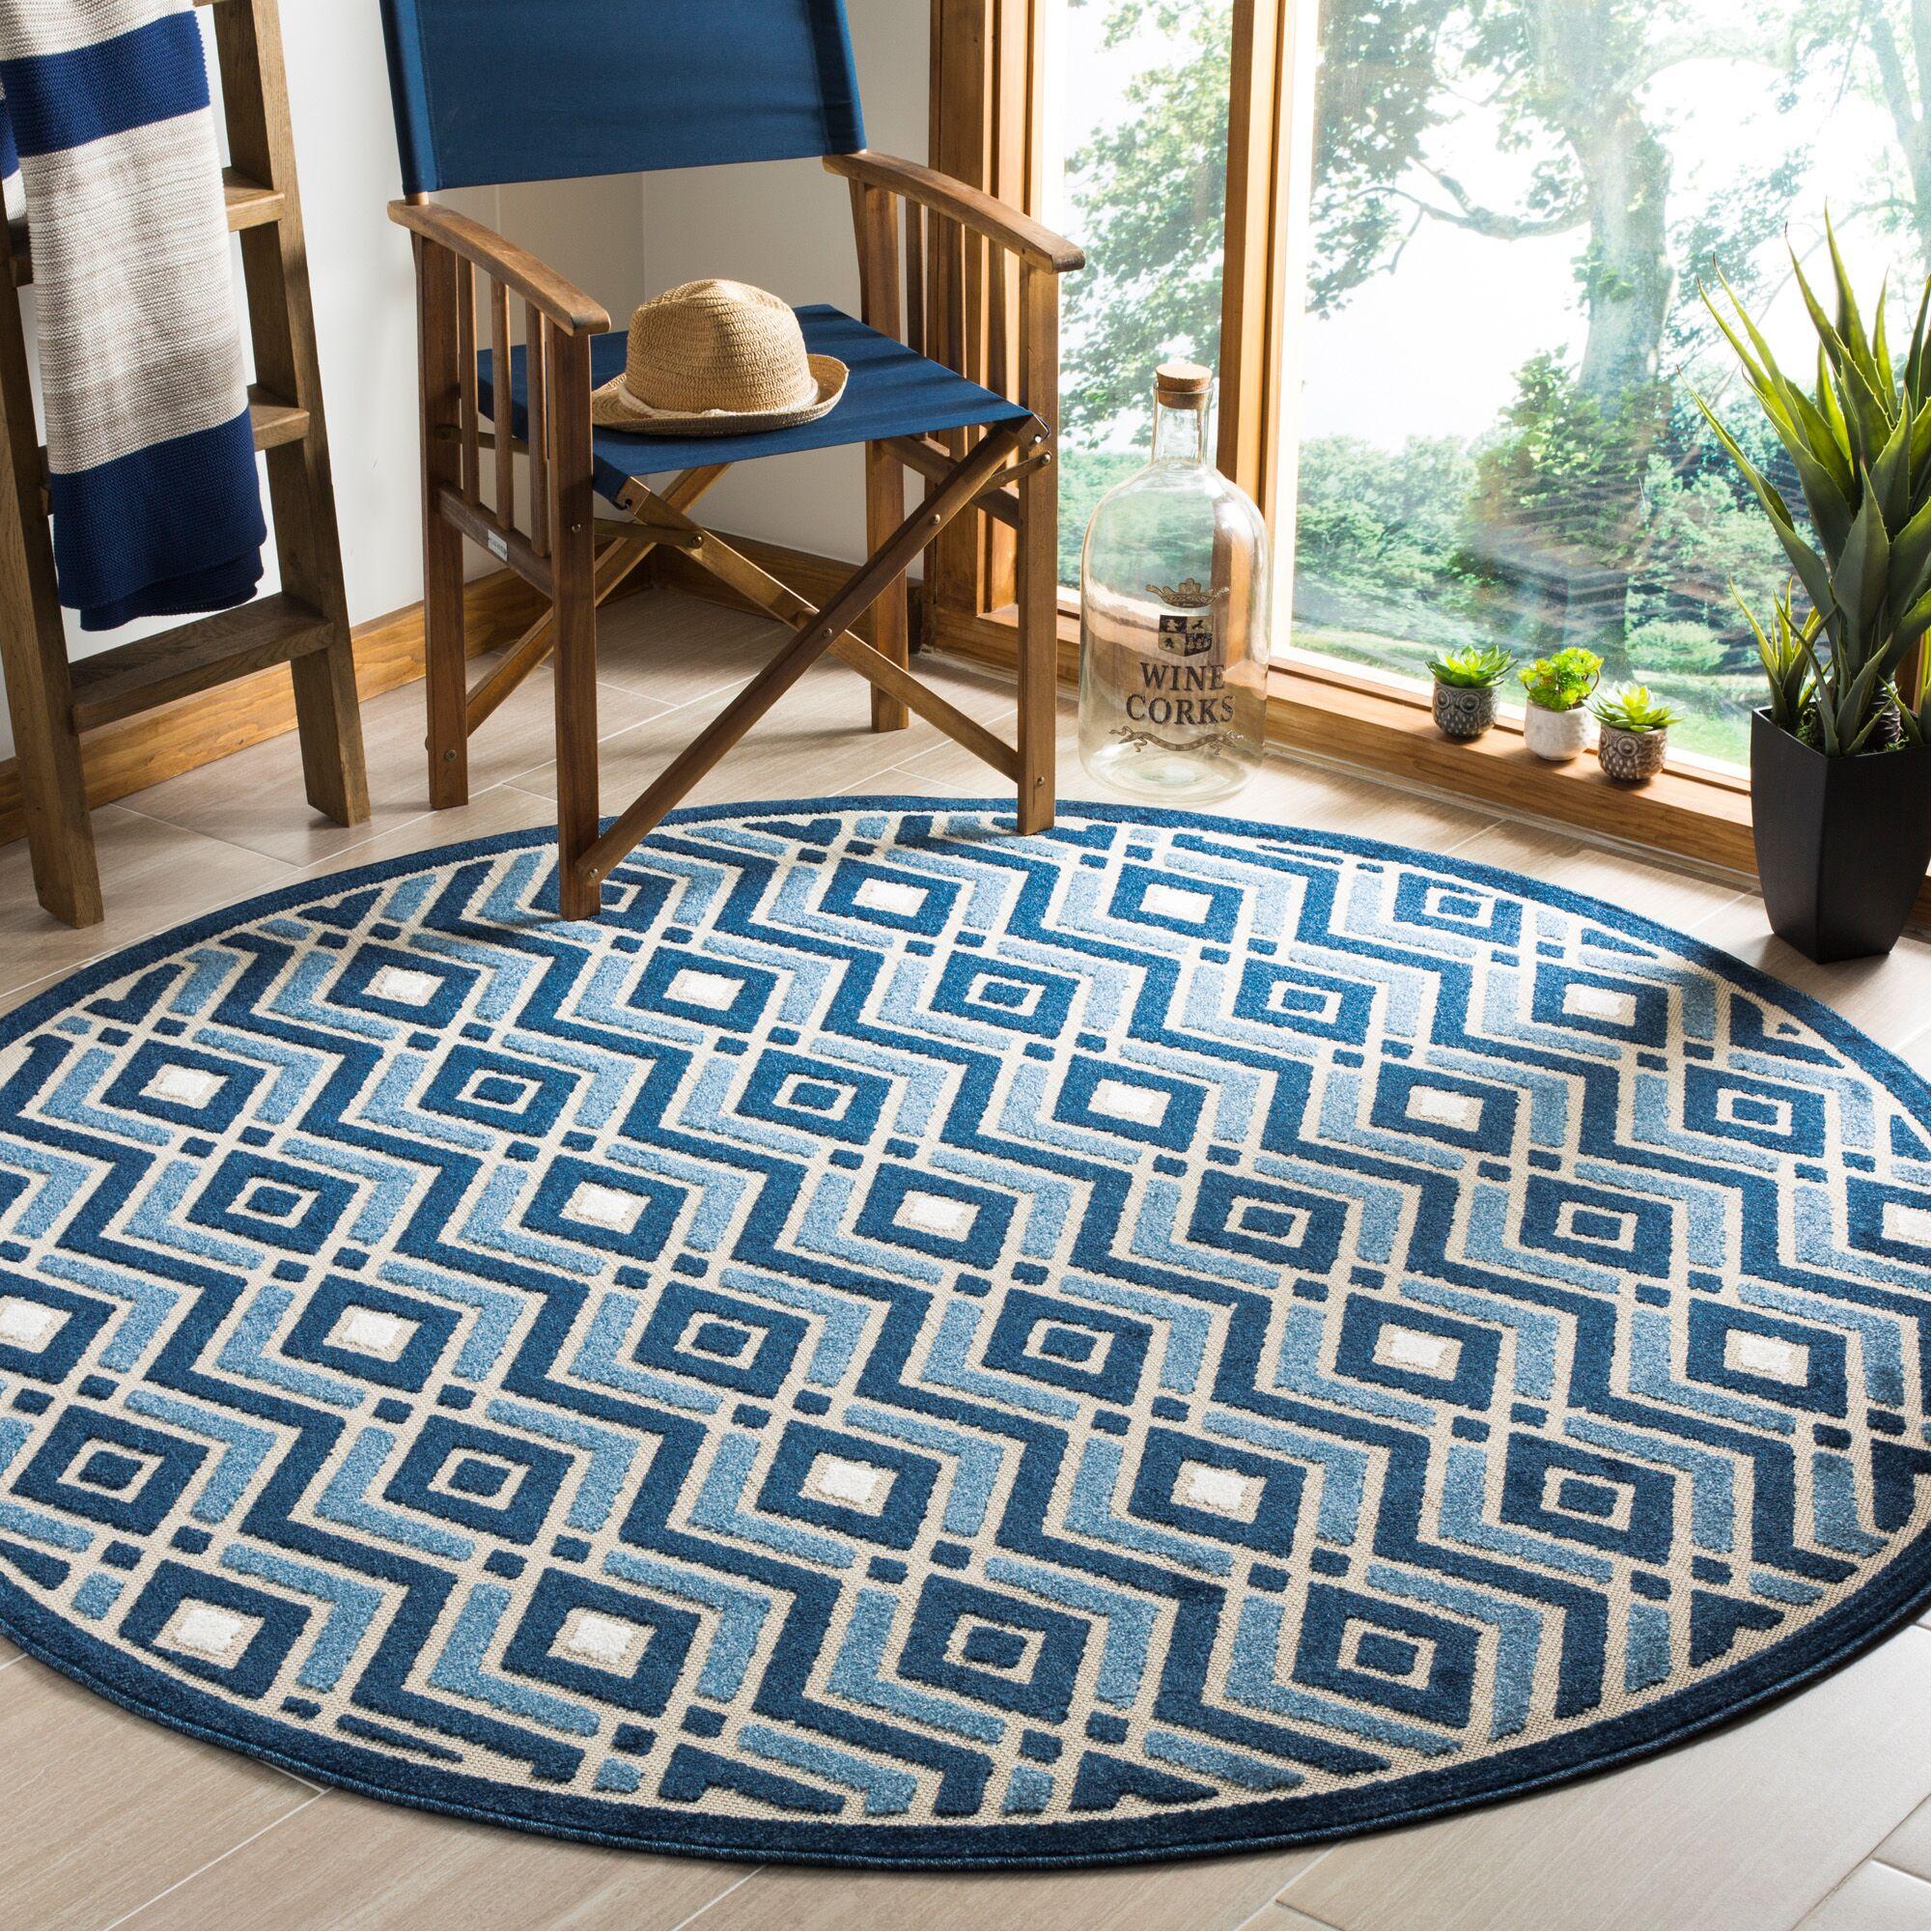 Charlot Blue Indoor/Outdoor Area Rug Rug Size: Round 6'7